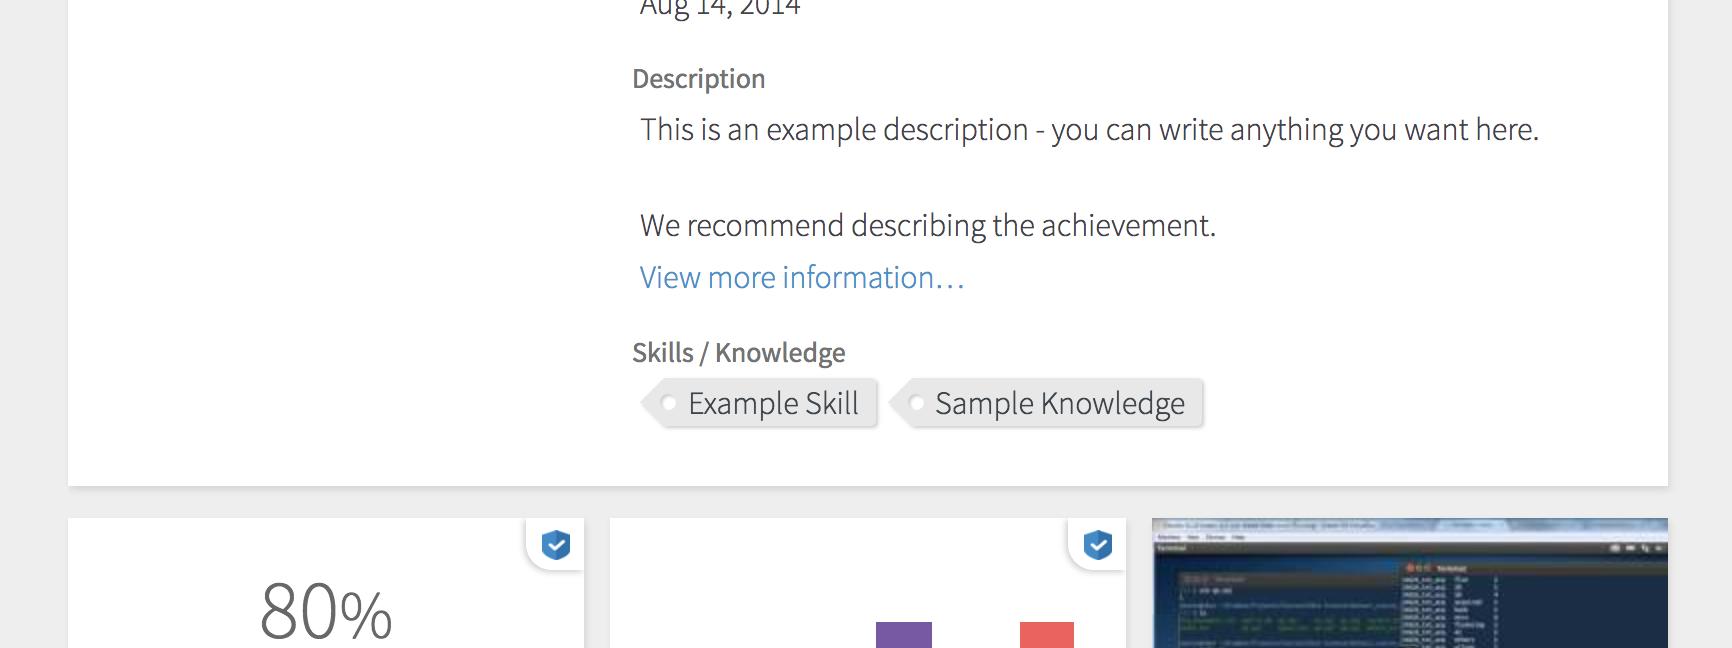 Adding Skills 1